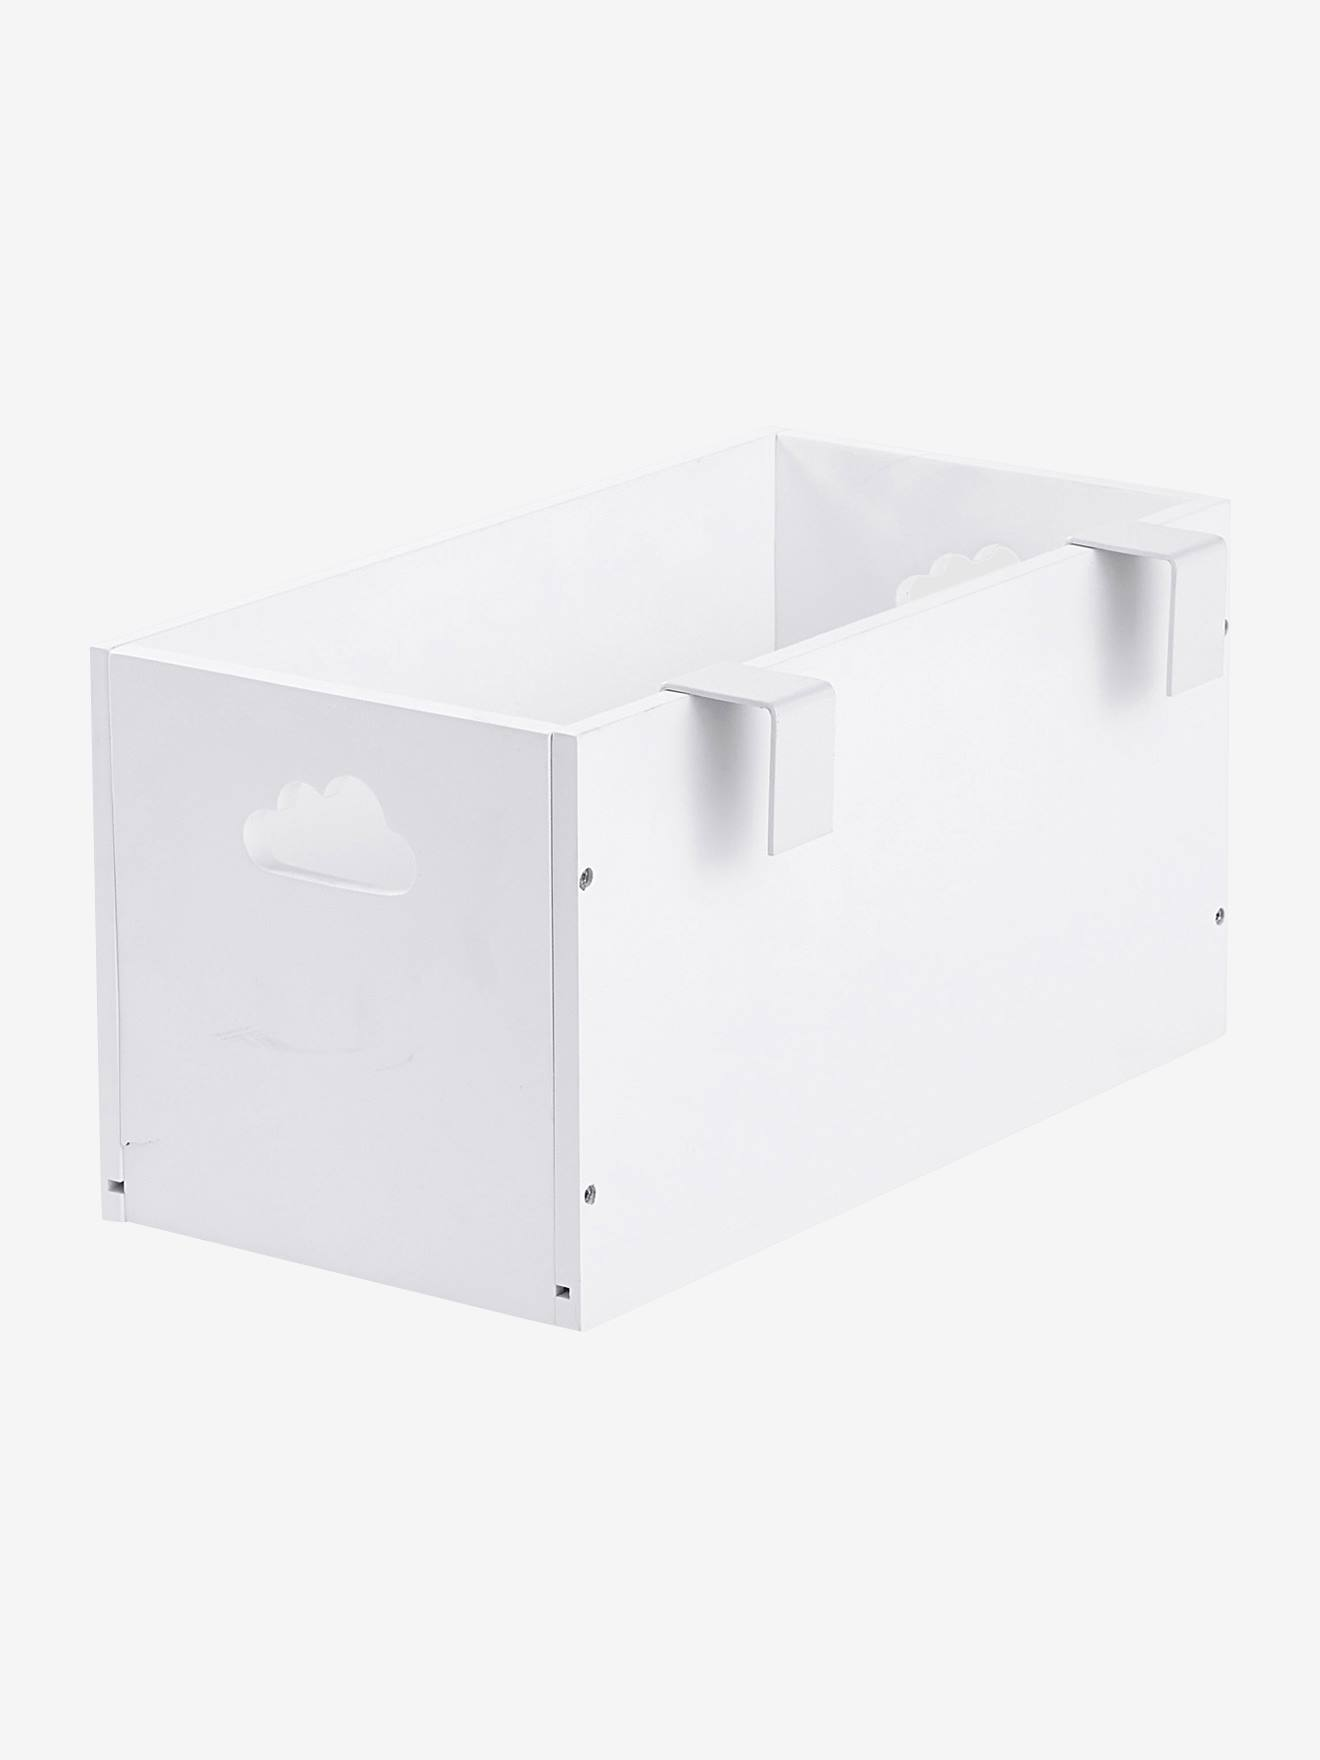 meubles et linge de table langerbote de with bac rangement. Black Bedroom Furniture Sets. Home Design Ideas